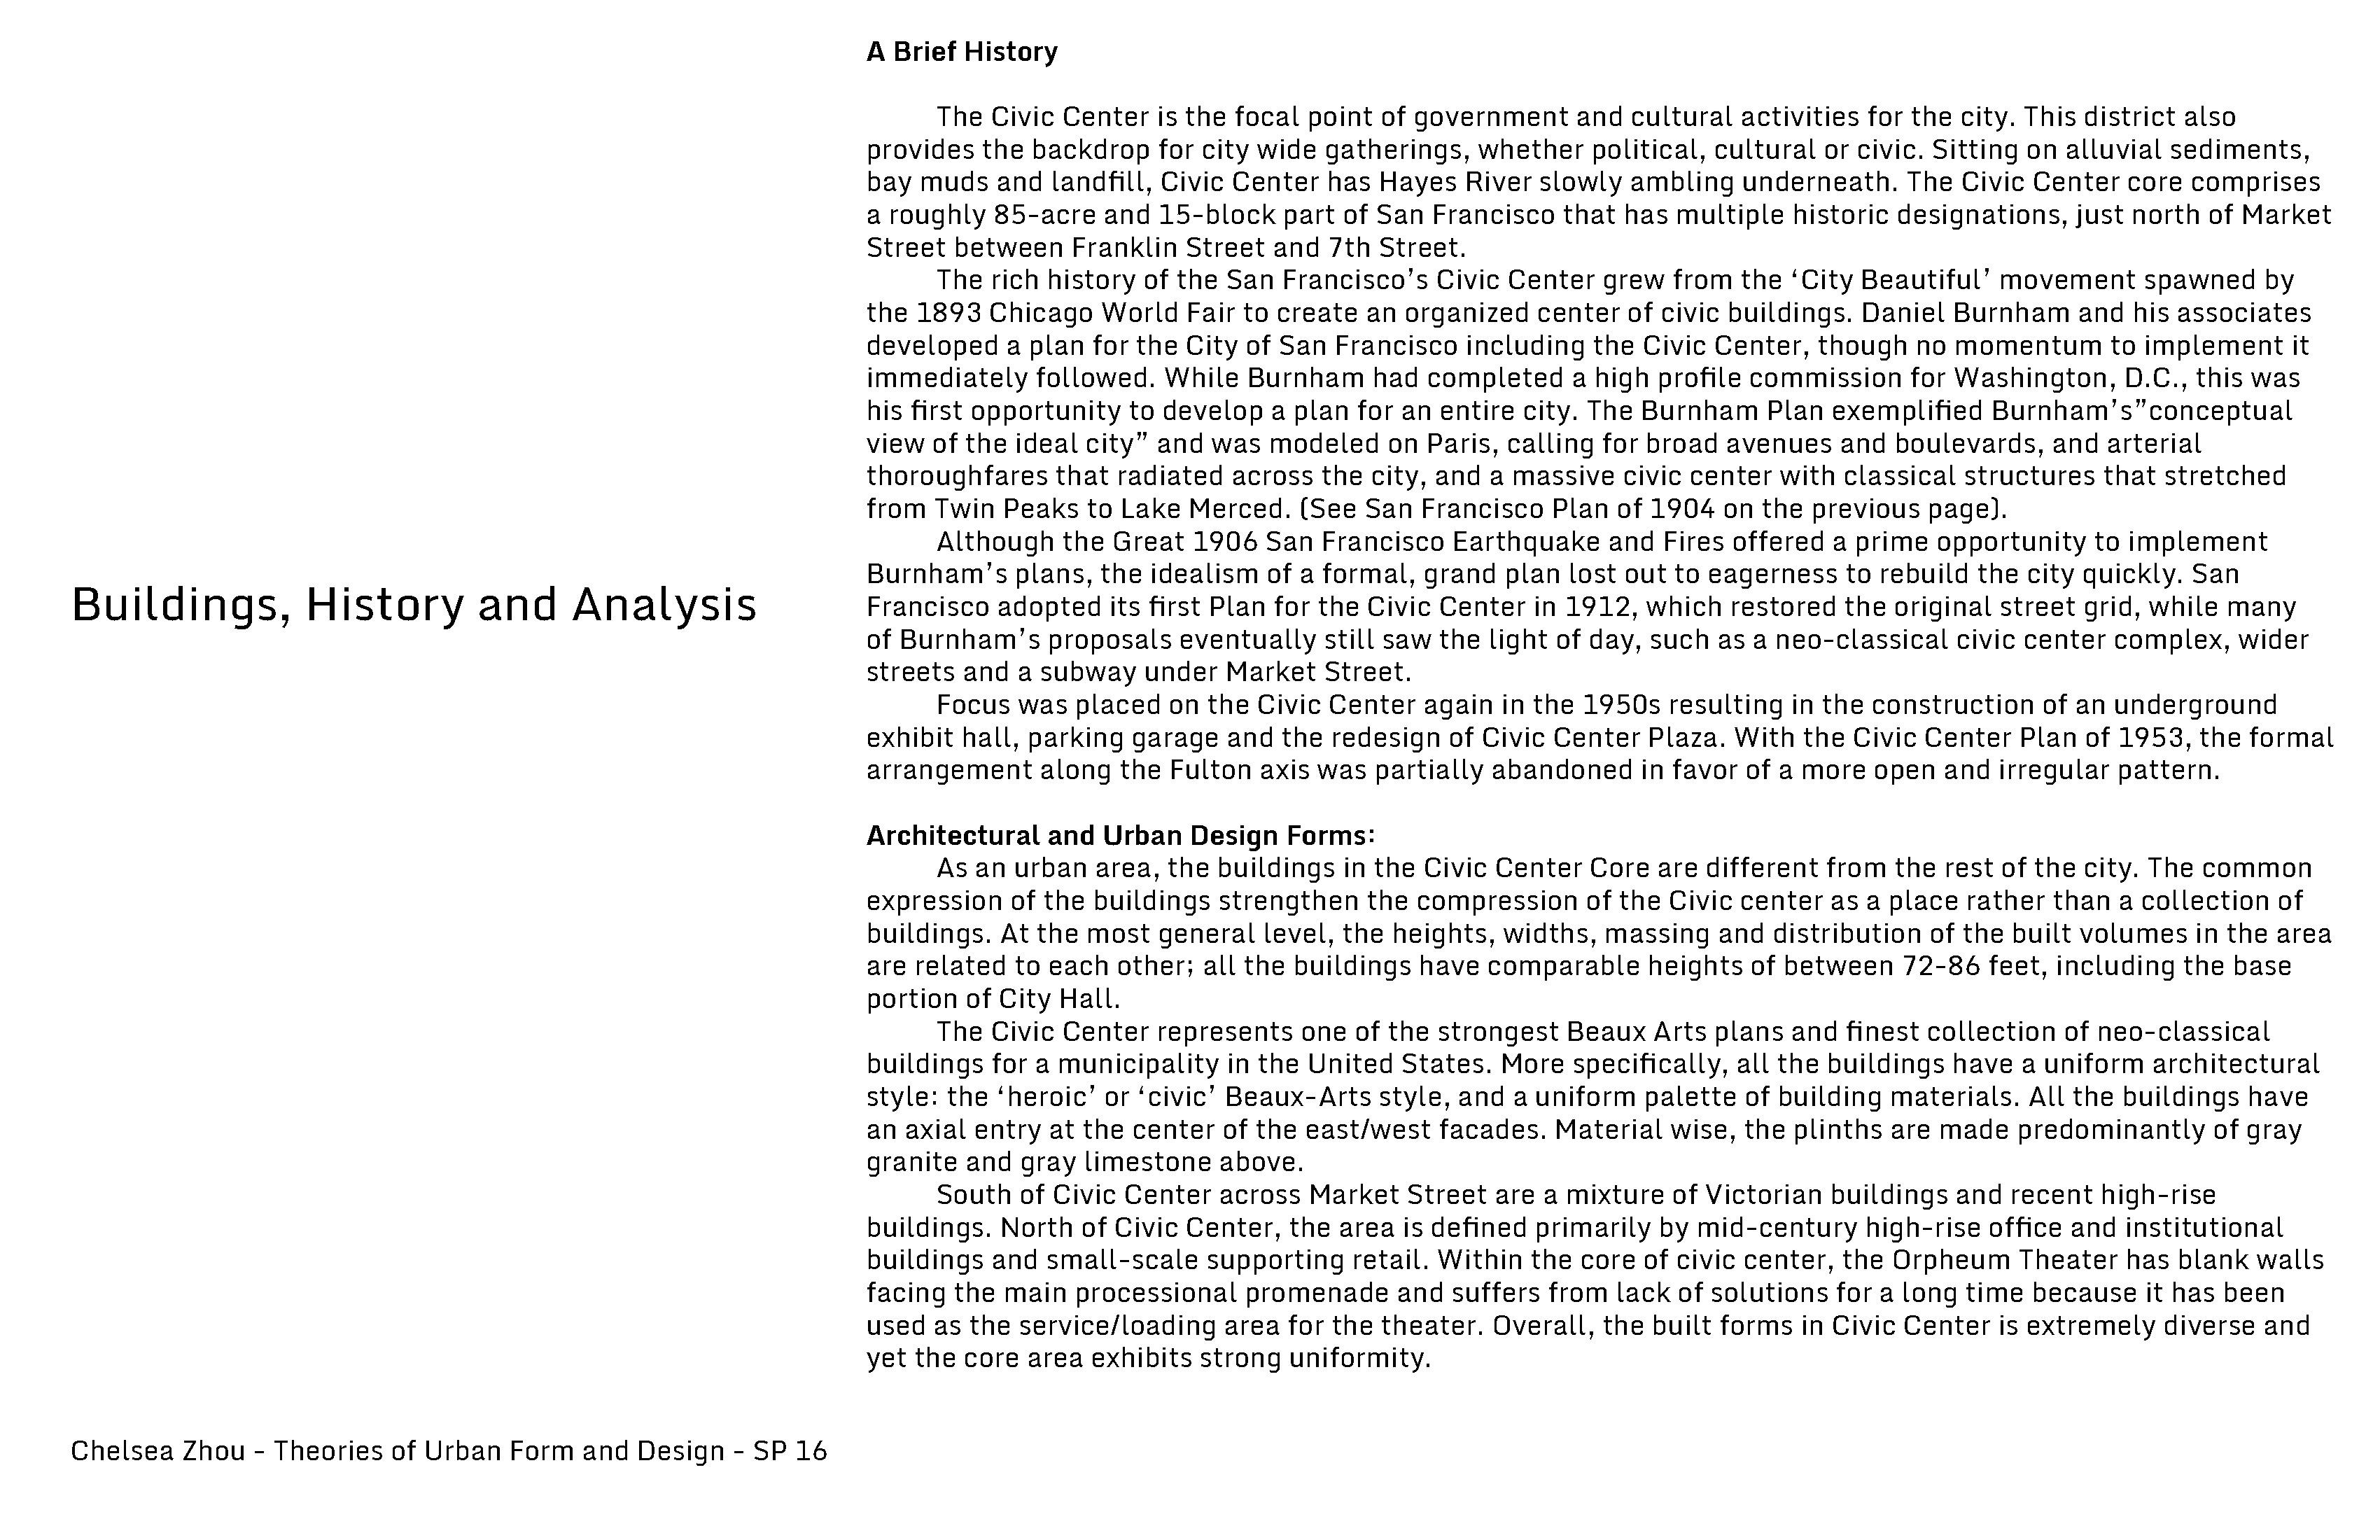 morph analysis cz final_Page_14